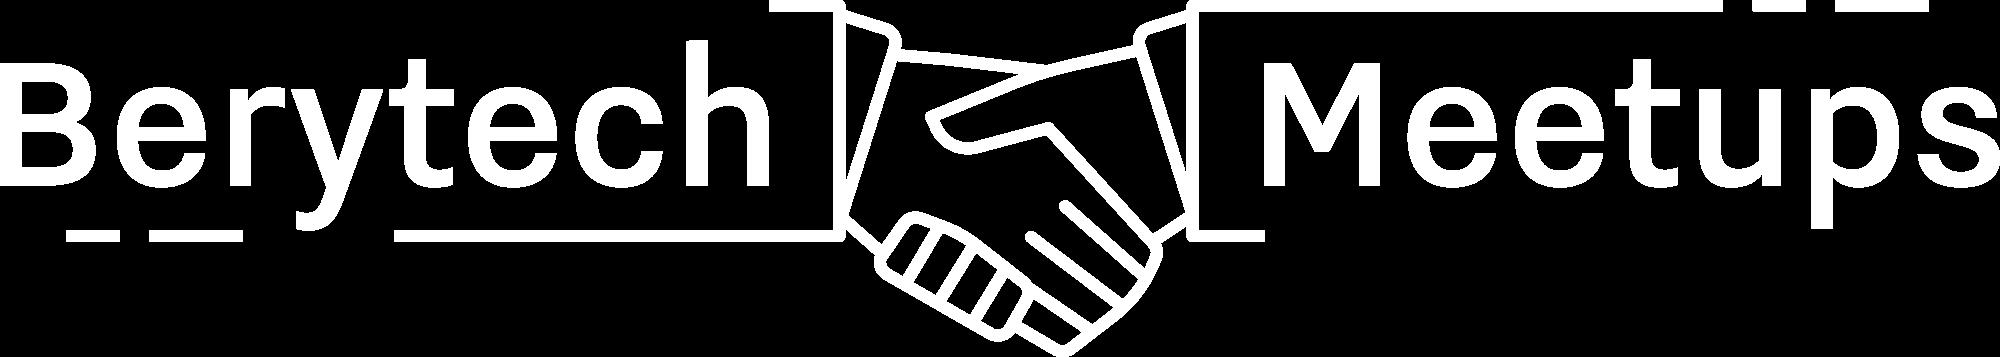 Berytech meetups logo white